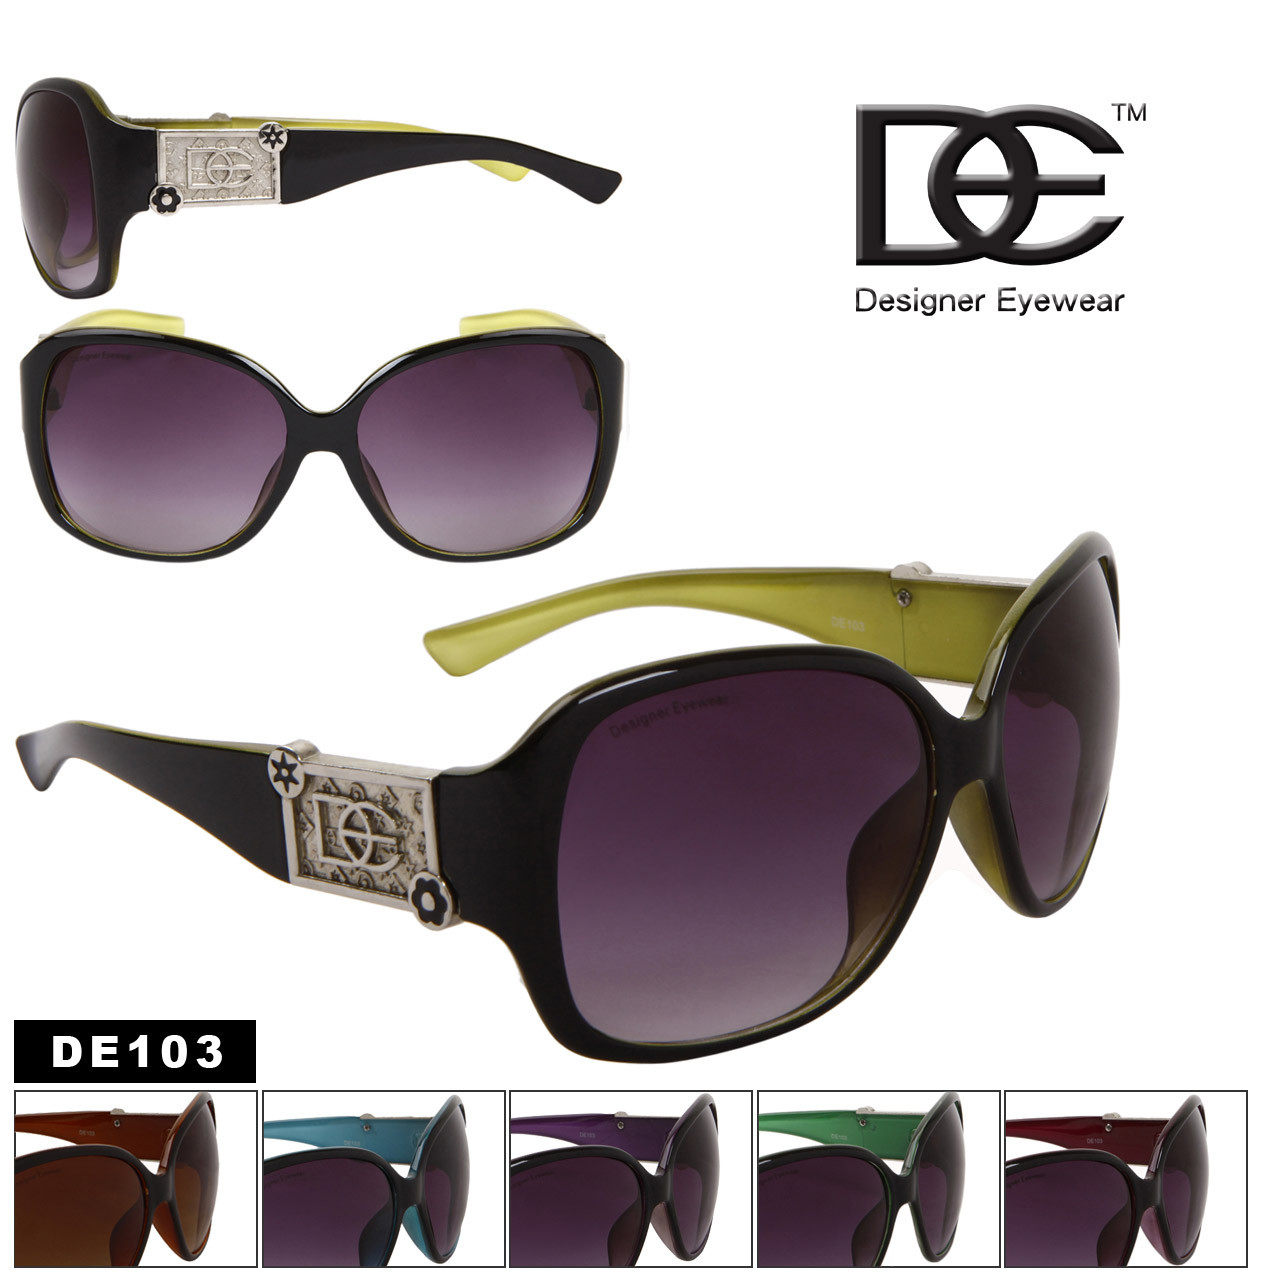 Wholesale Fashion Sunglasses | DE Designer Eyewear